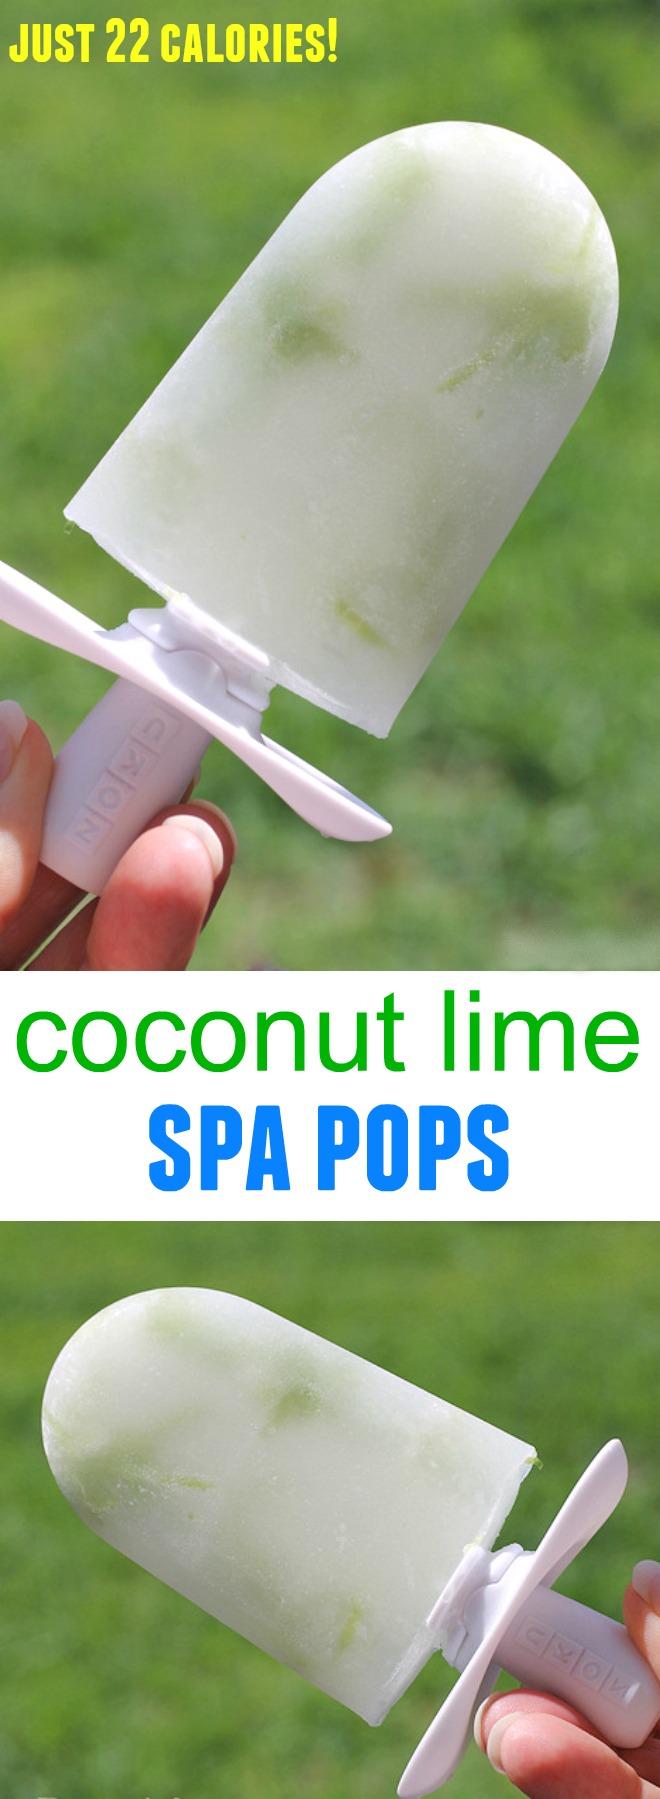 coconut lime spa pops - just 22 calories